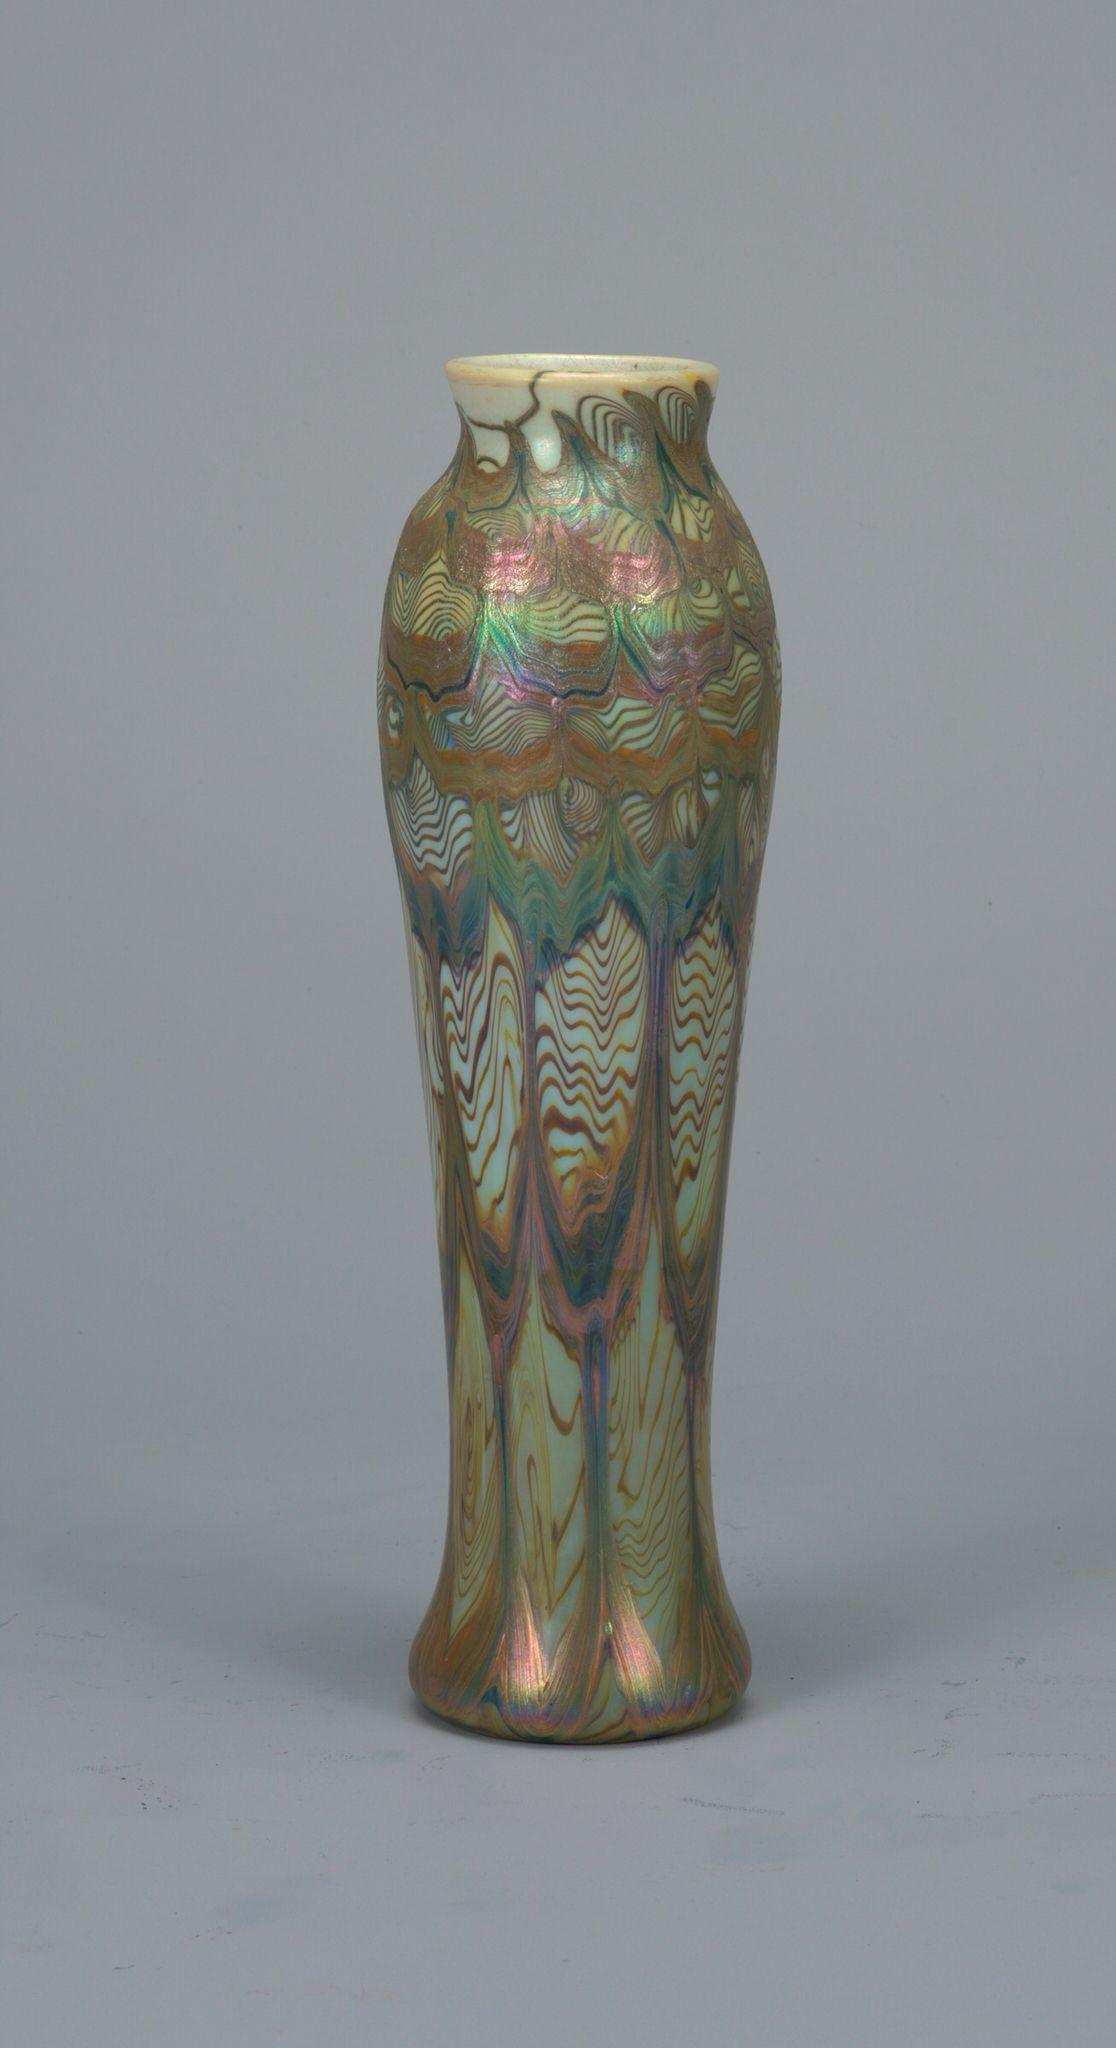 lc tiffany favrile vase of l c tiffany favrile glass vase l c tiffanytiffany studios inside l c tiffany favrile glass vase